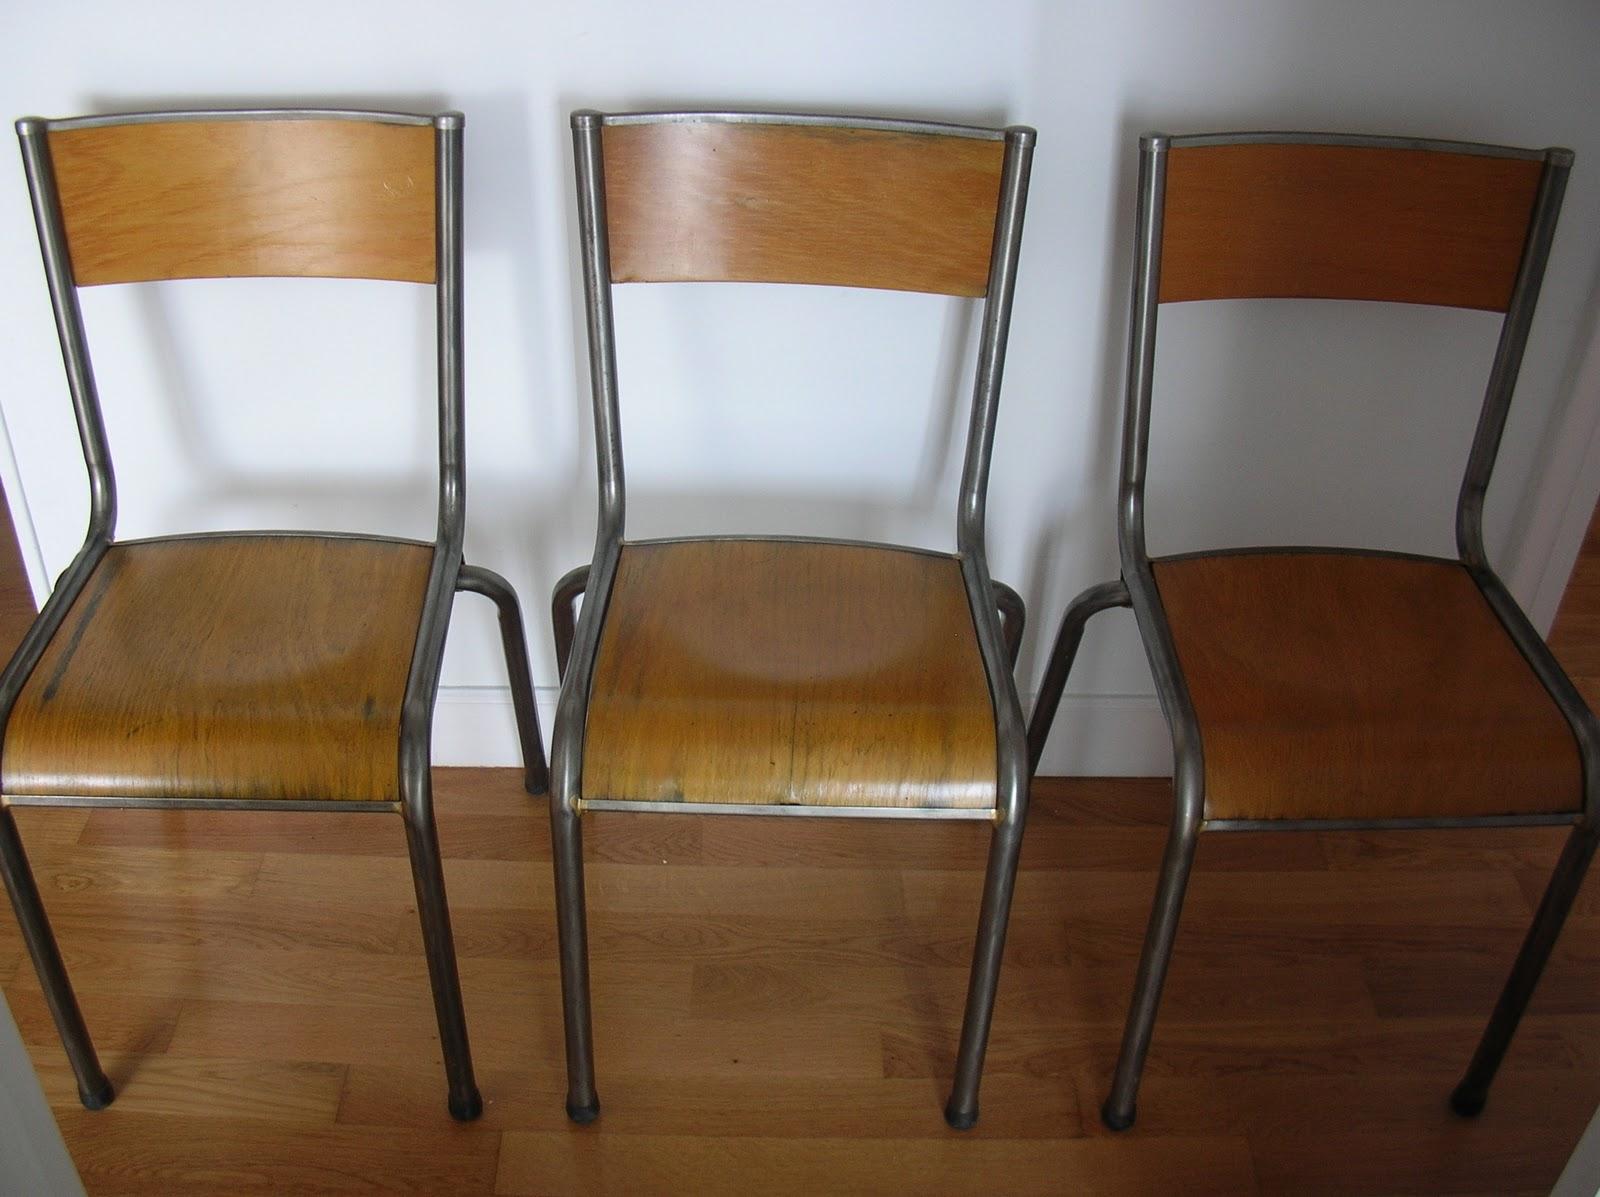 Sillas restauradas de madera latest broca sillas - Sillas restauradas ...